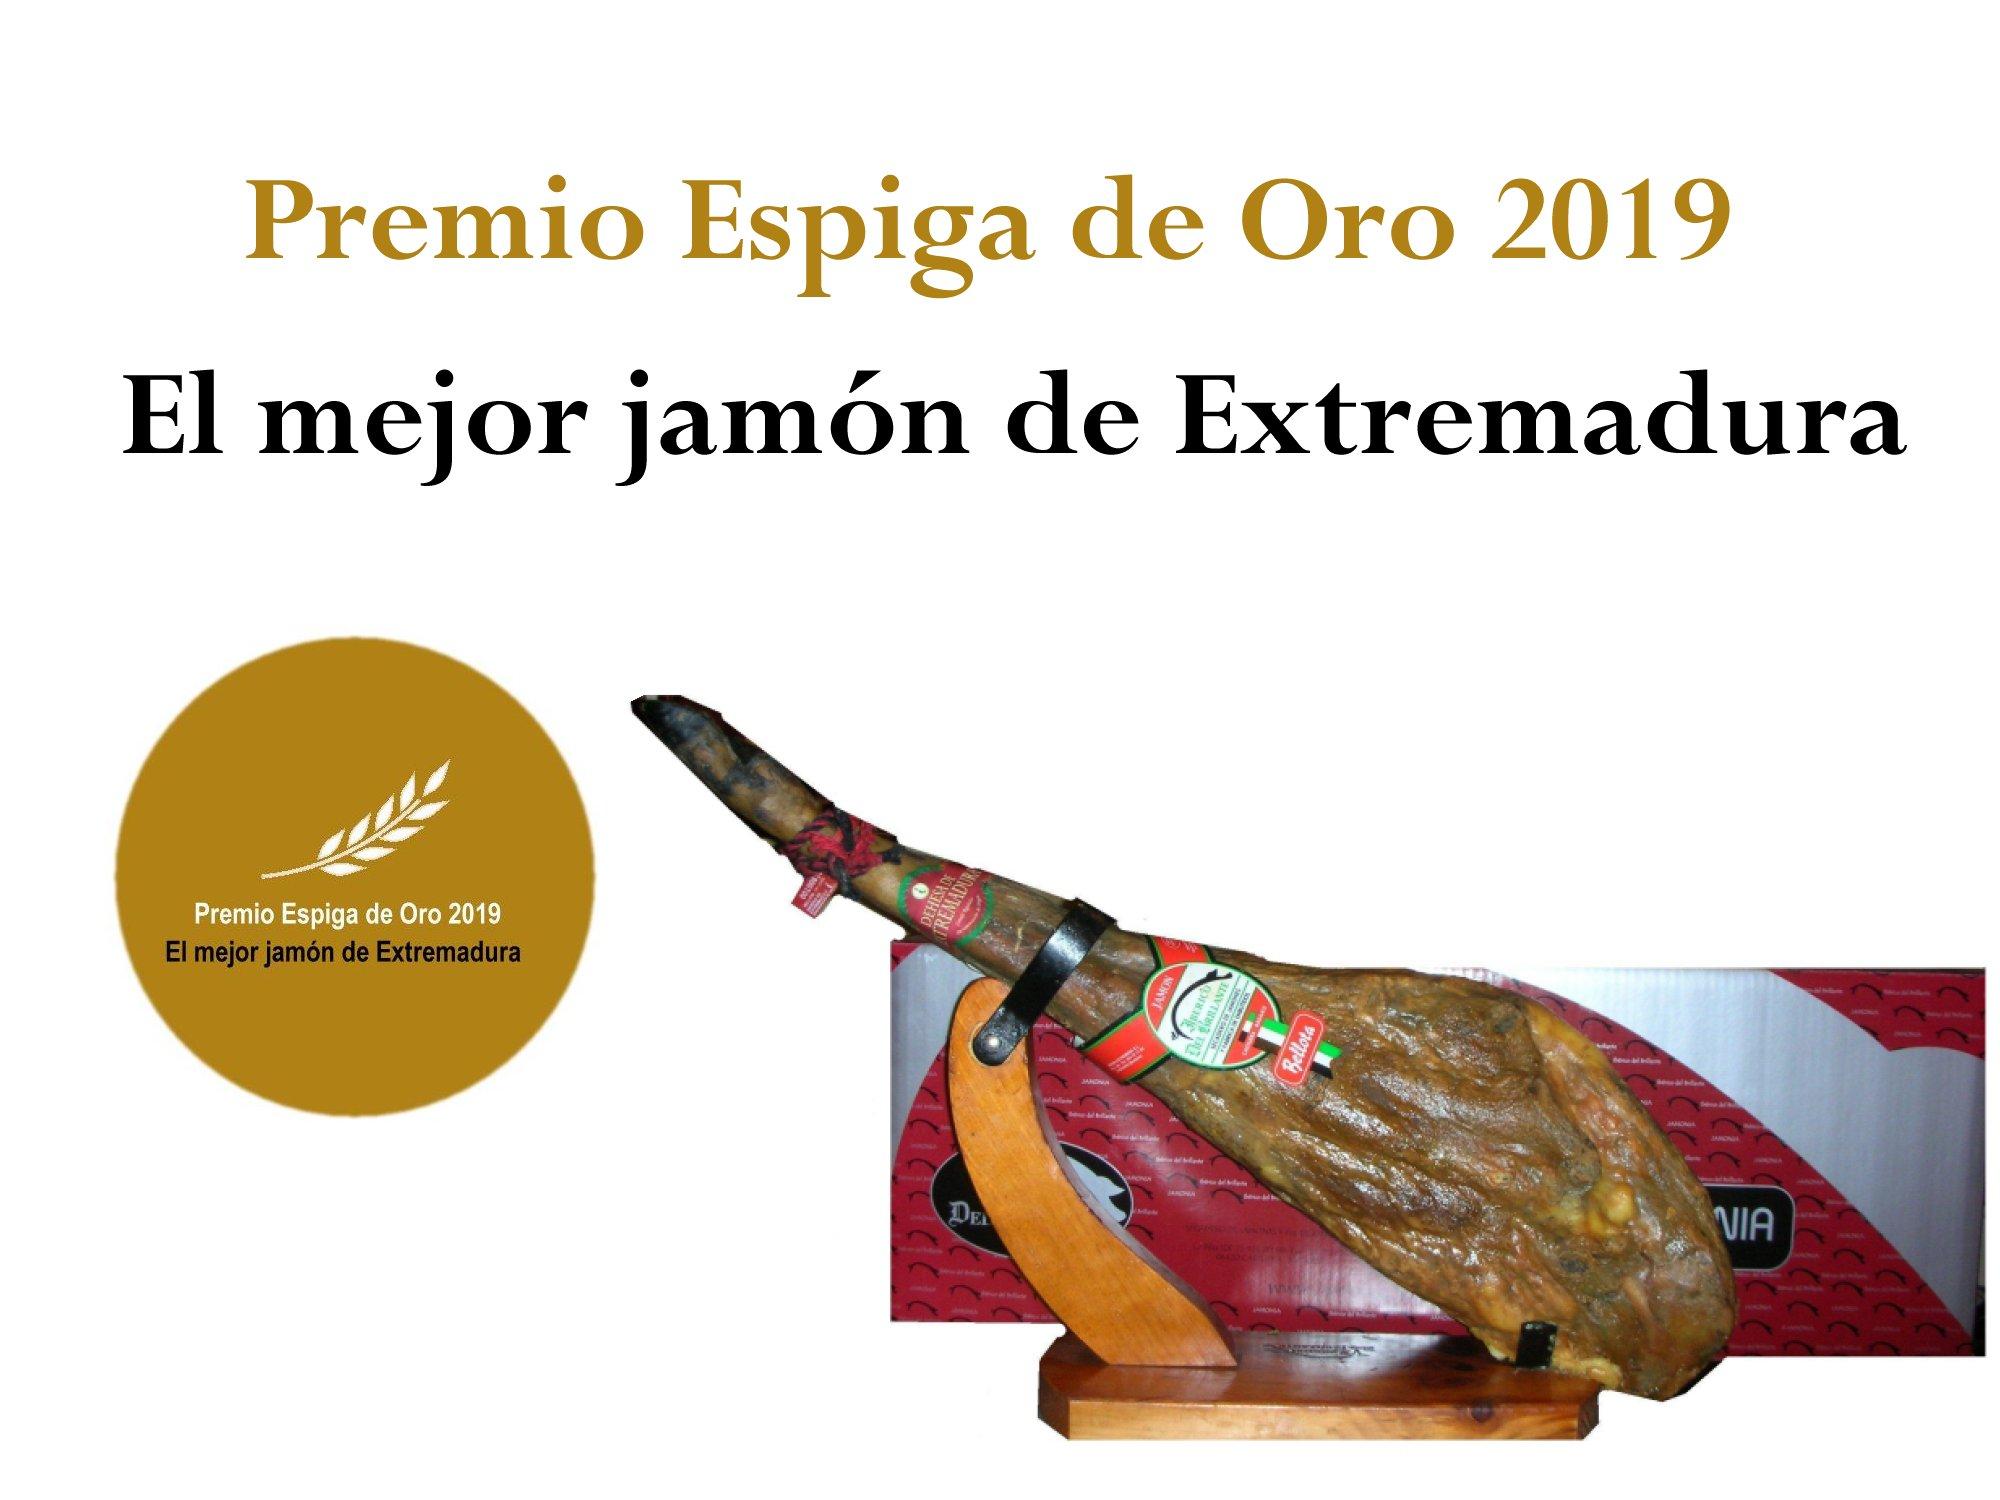 Premio Espiga de Oro 2019